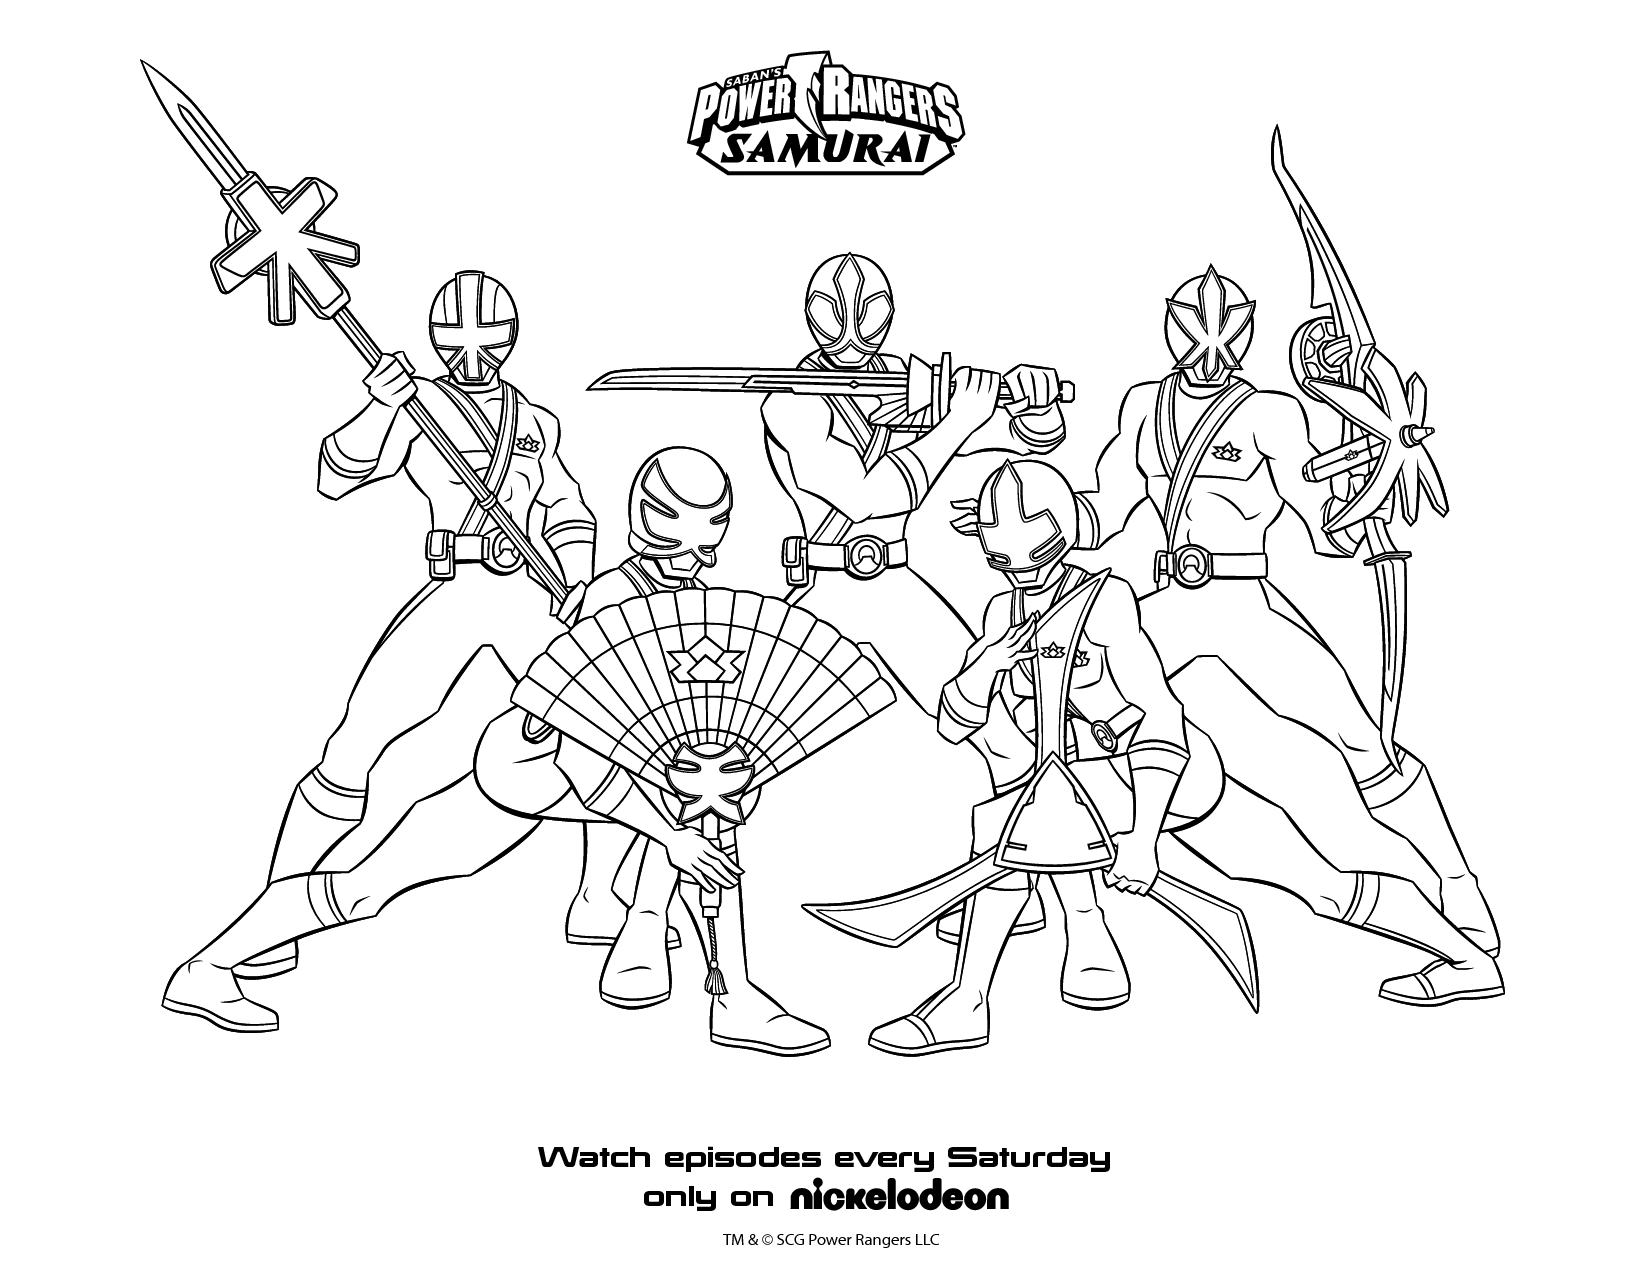 Power Ranger Samurai Coloring Pages